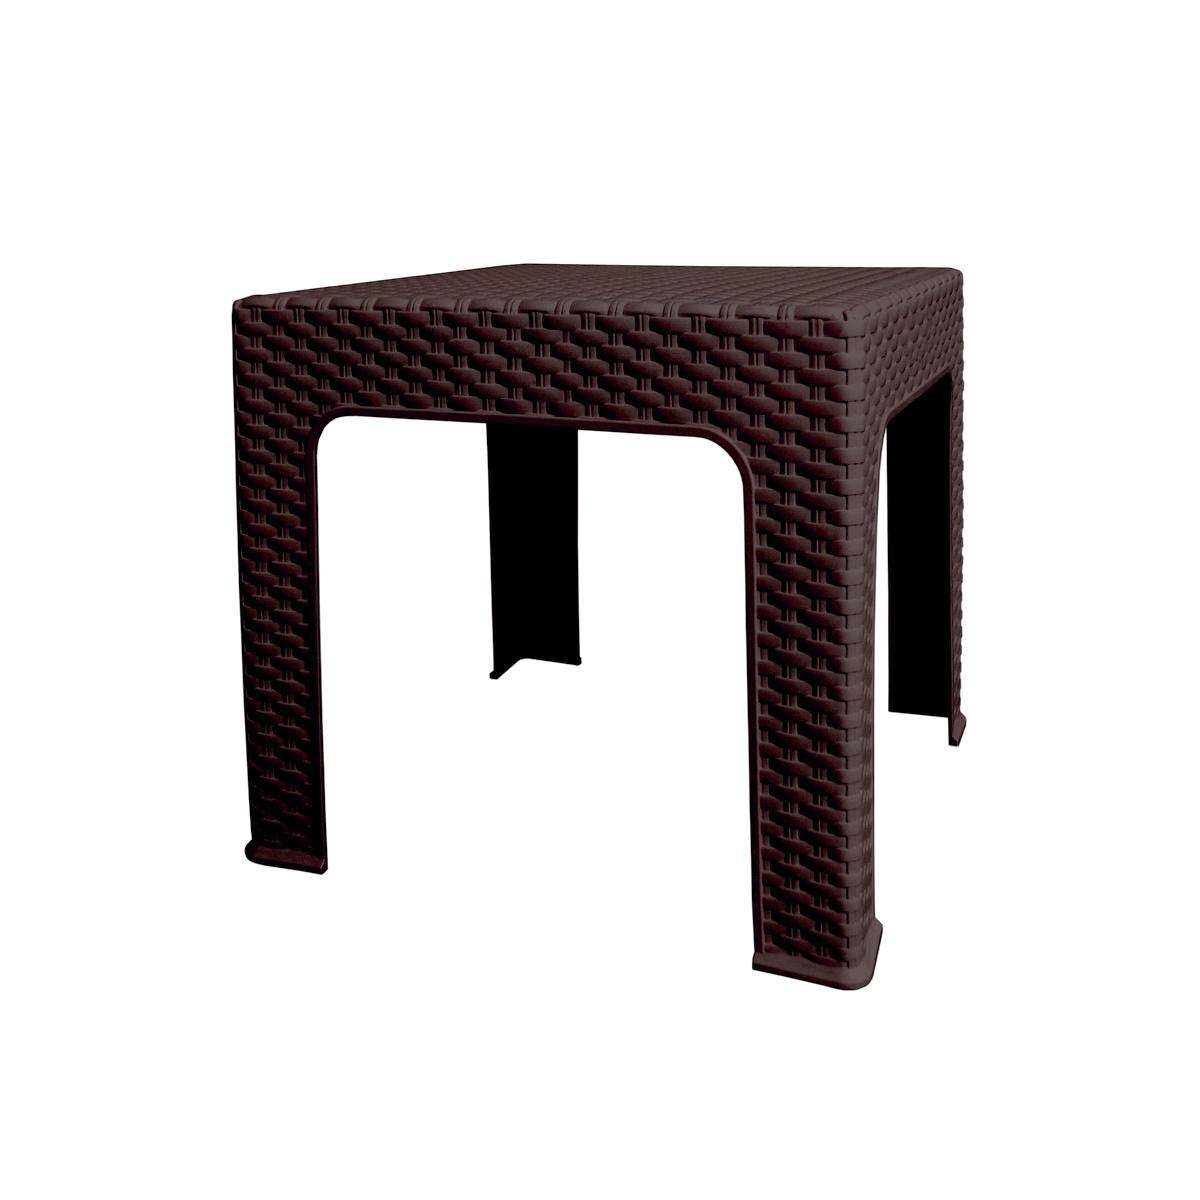 Záhradný stolík Bistro Ratan, 42 x 48 x 48 cm, wenge